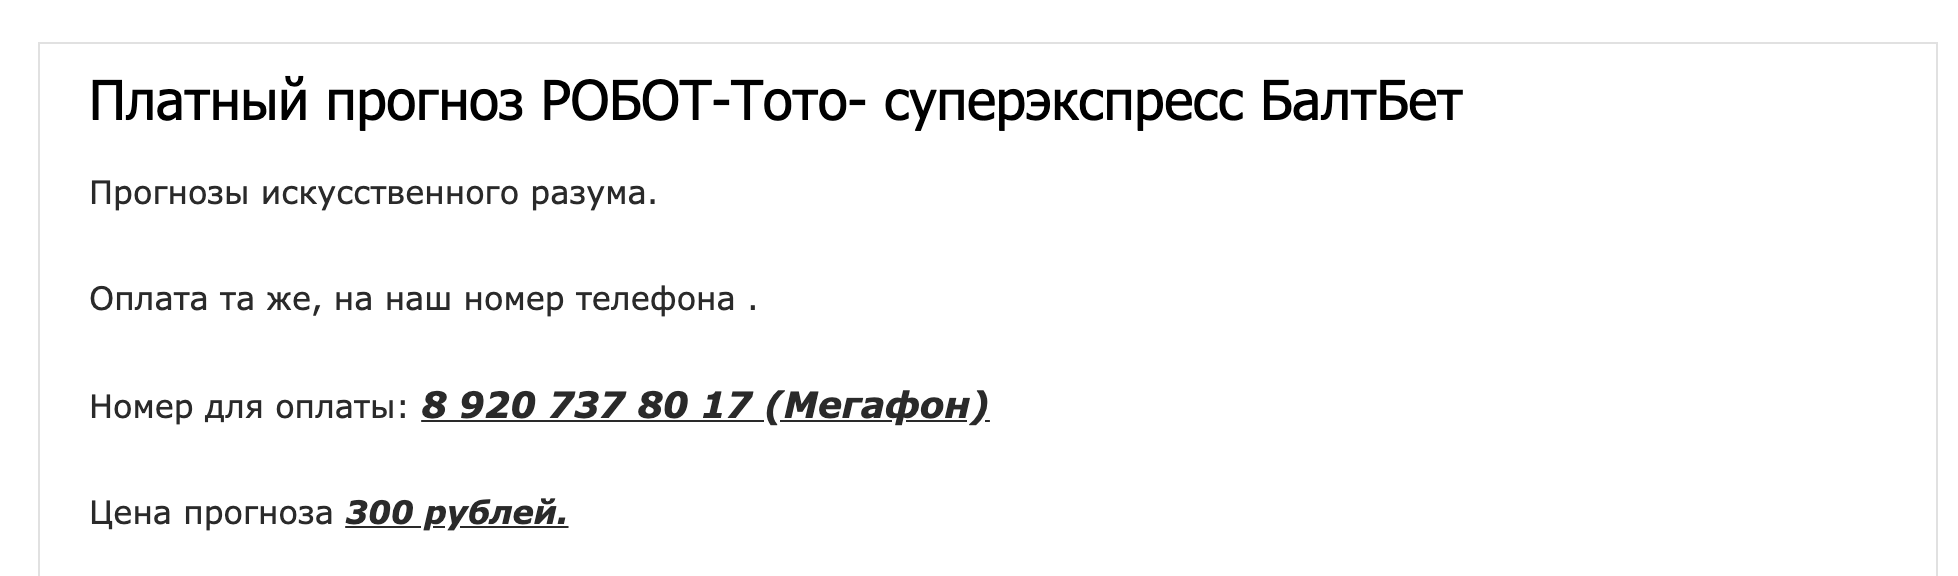 Платный прогноз РОБОТ Toto-s (Тото Суперэкспресс)